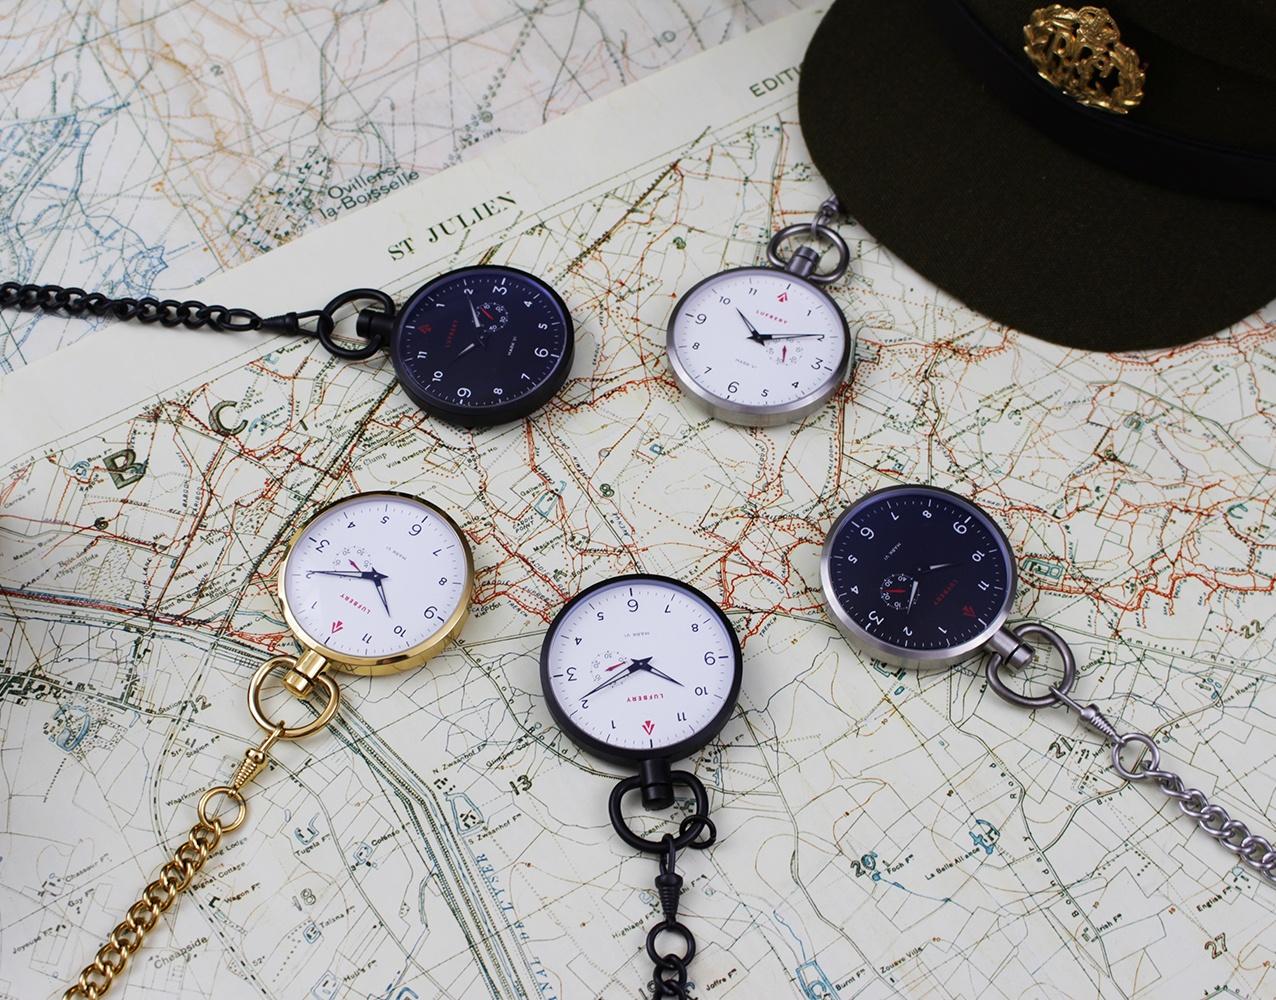 Lufbery WW1-Inspired Pocket Watches